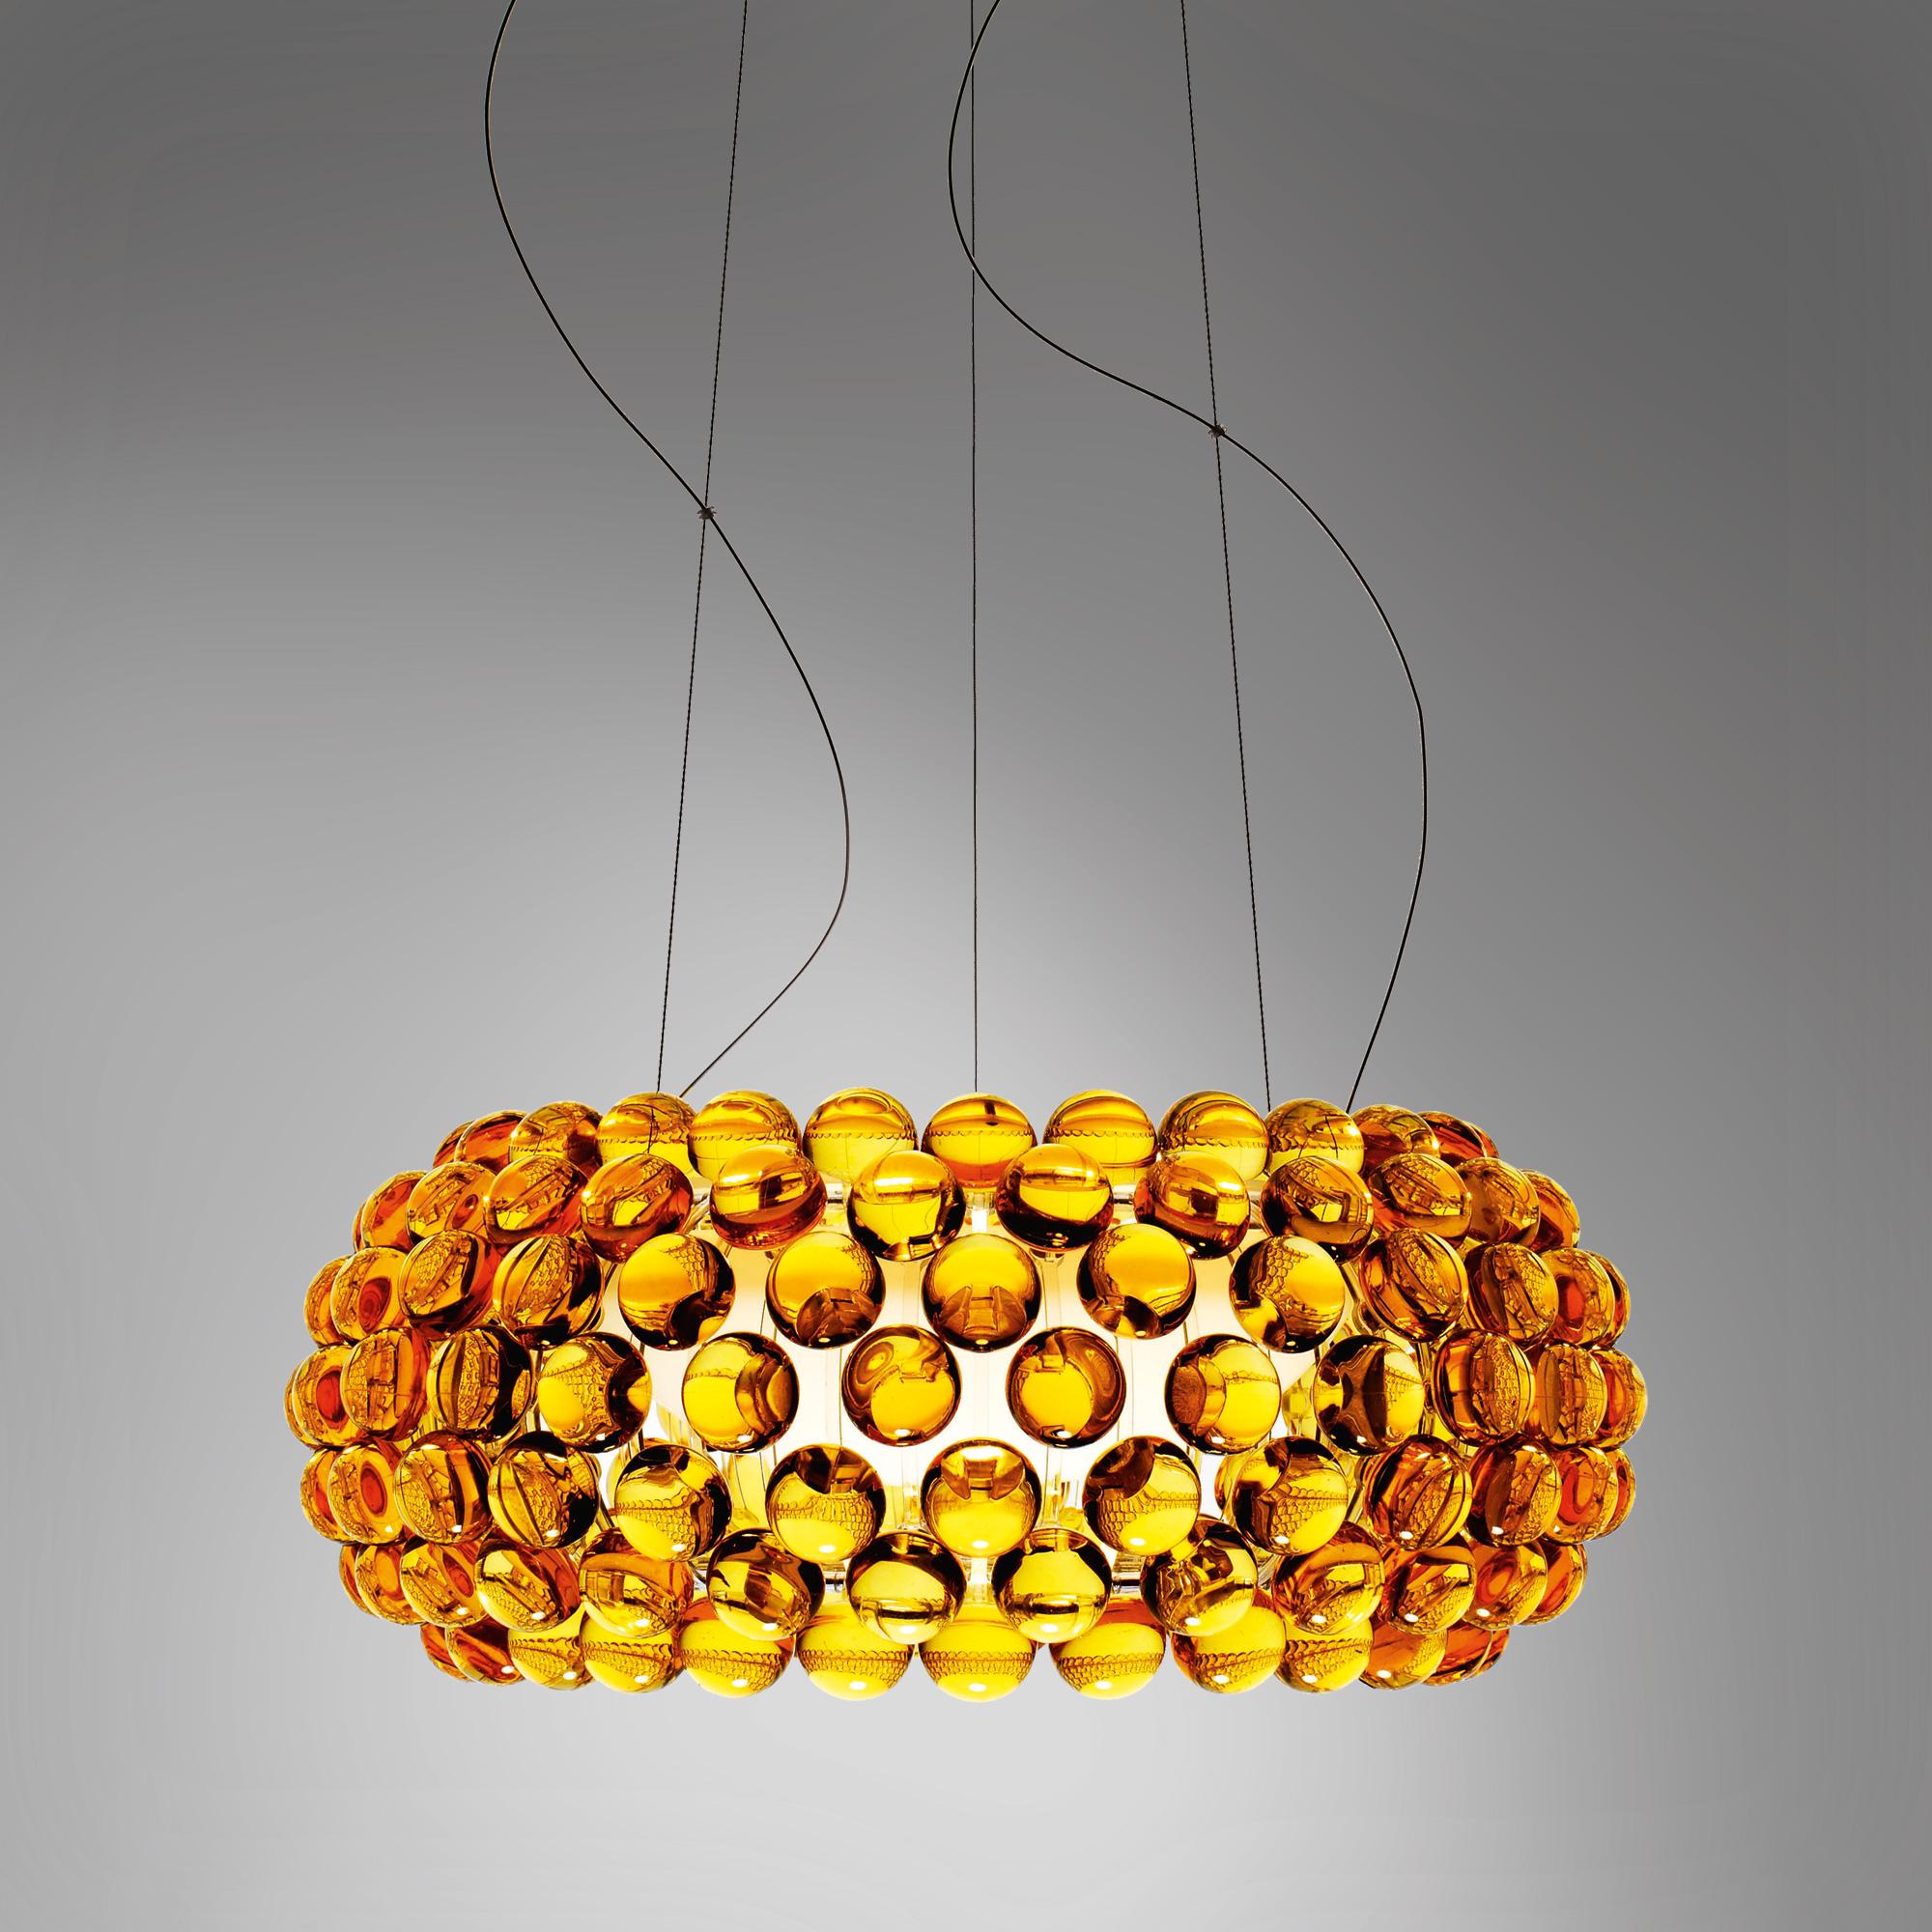 foscarini caboche media sospensione pendelleuchte 13800752 reuter onlineshop. Black Bedroom Furniture Sets. Home Design Ideas